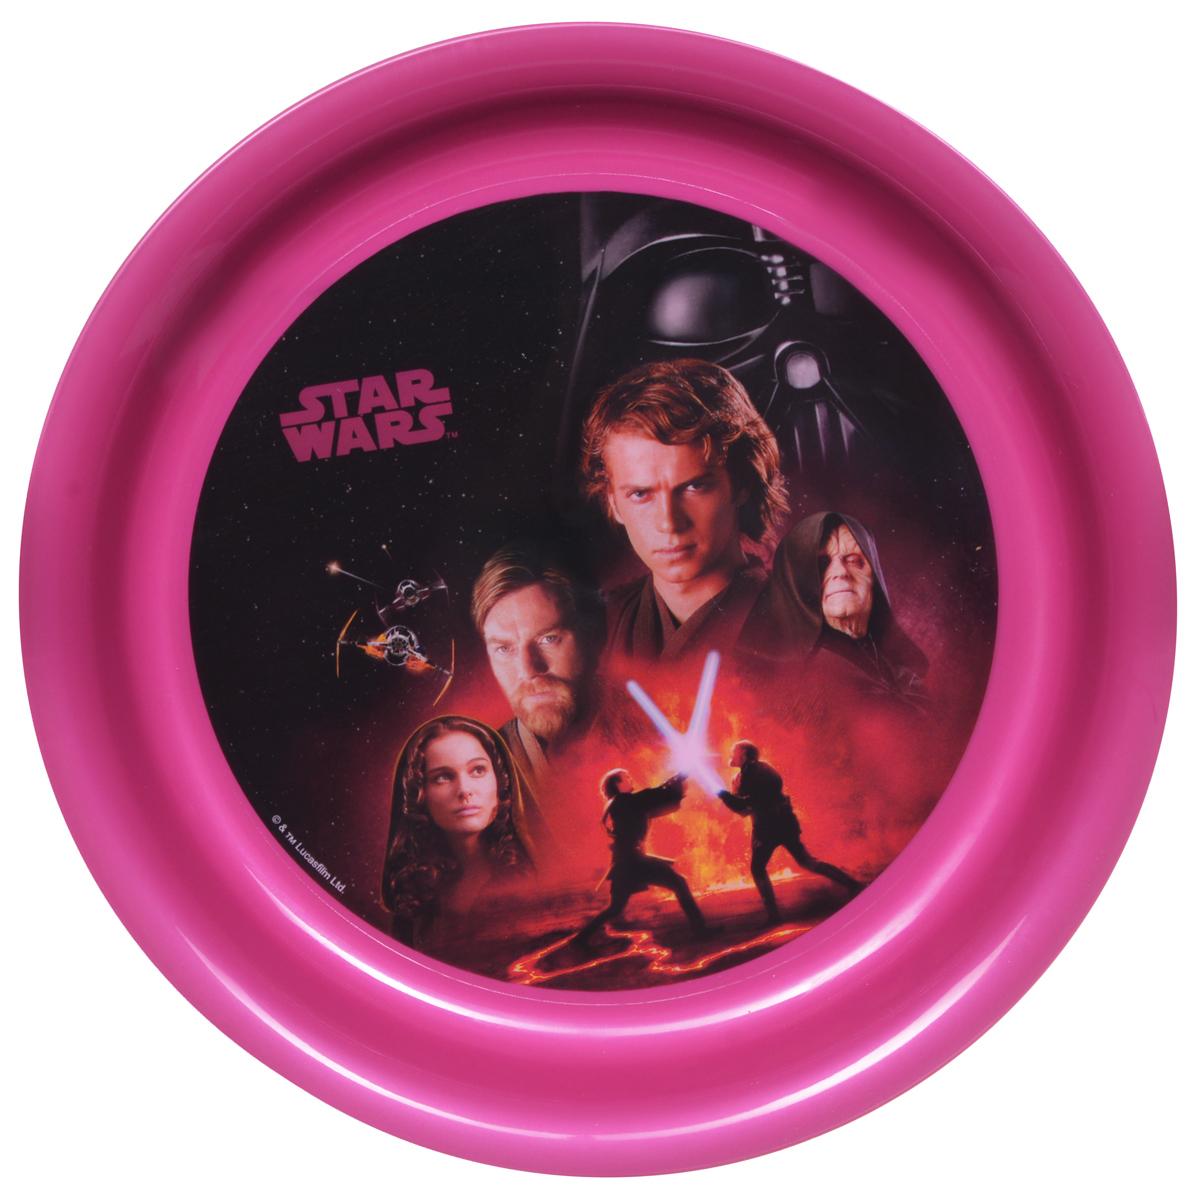 Star Wars Тарелка детская диаметр 19 см